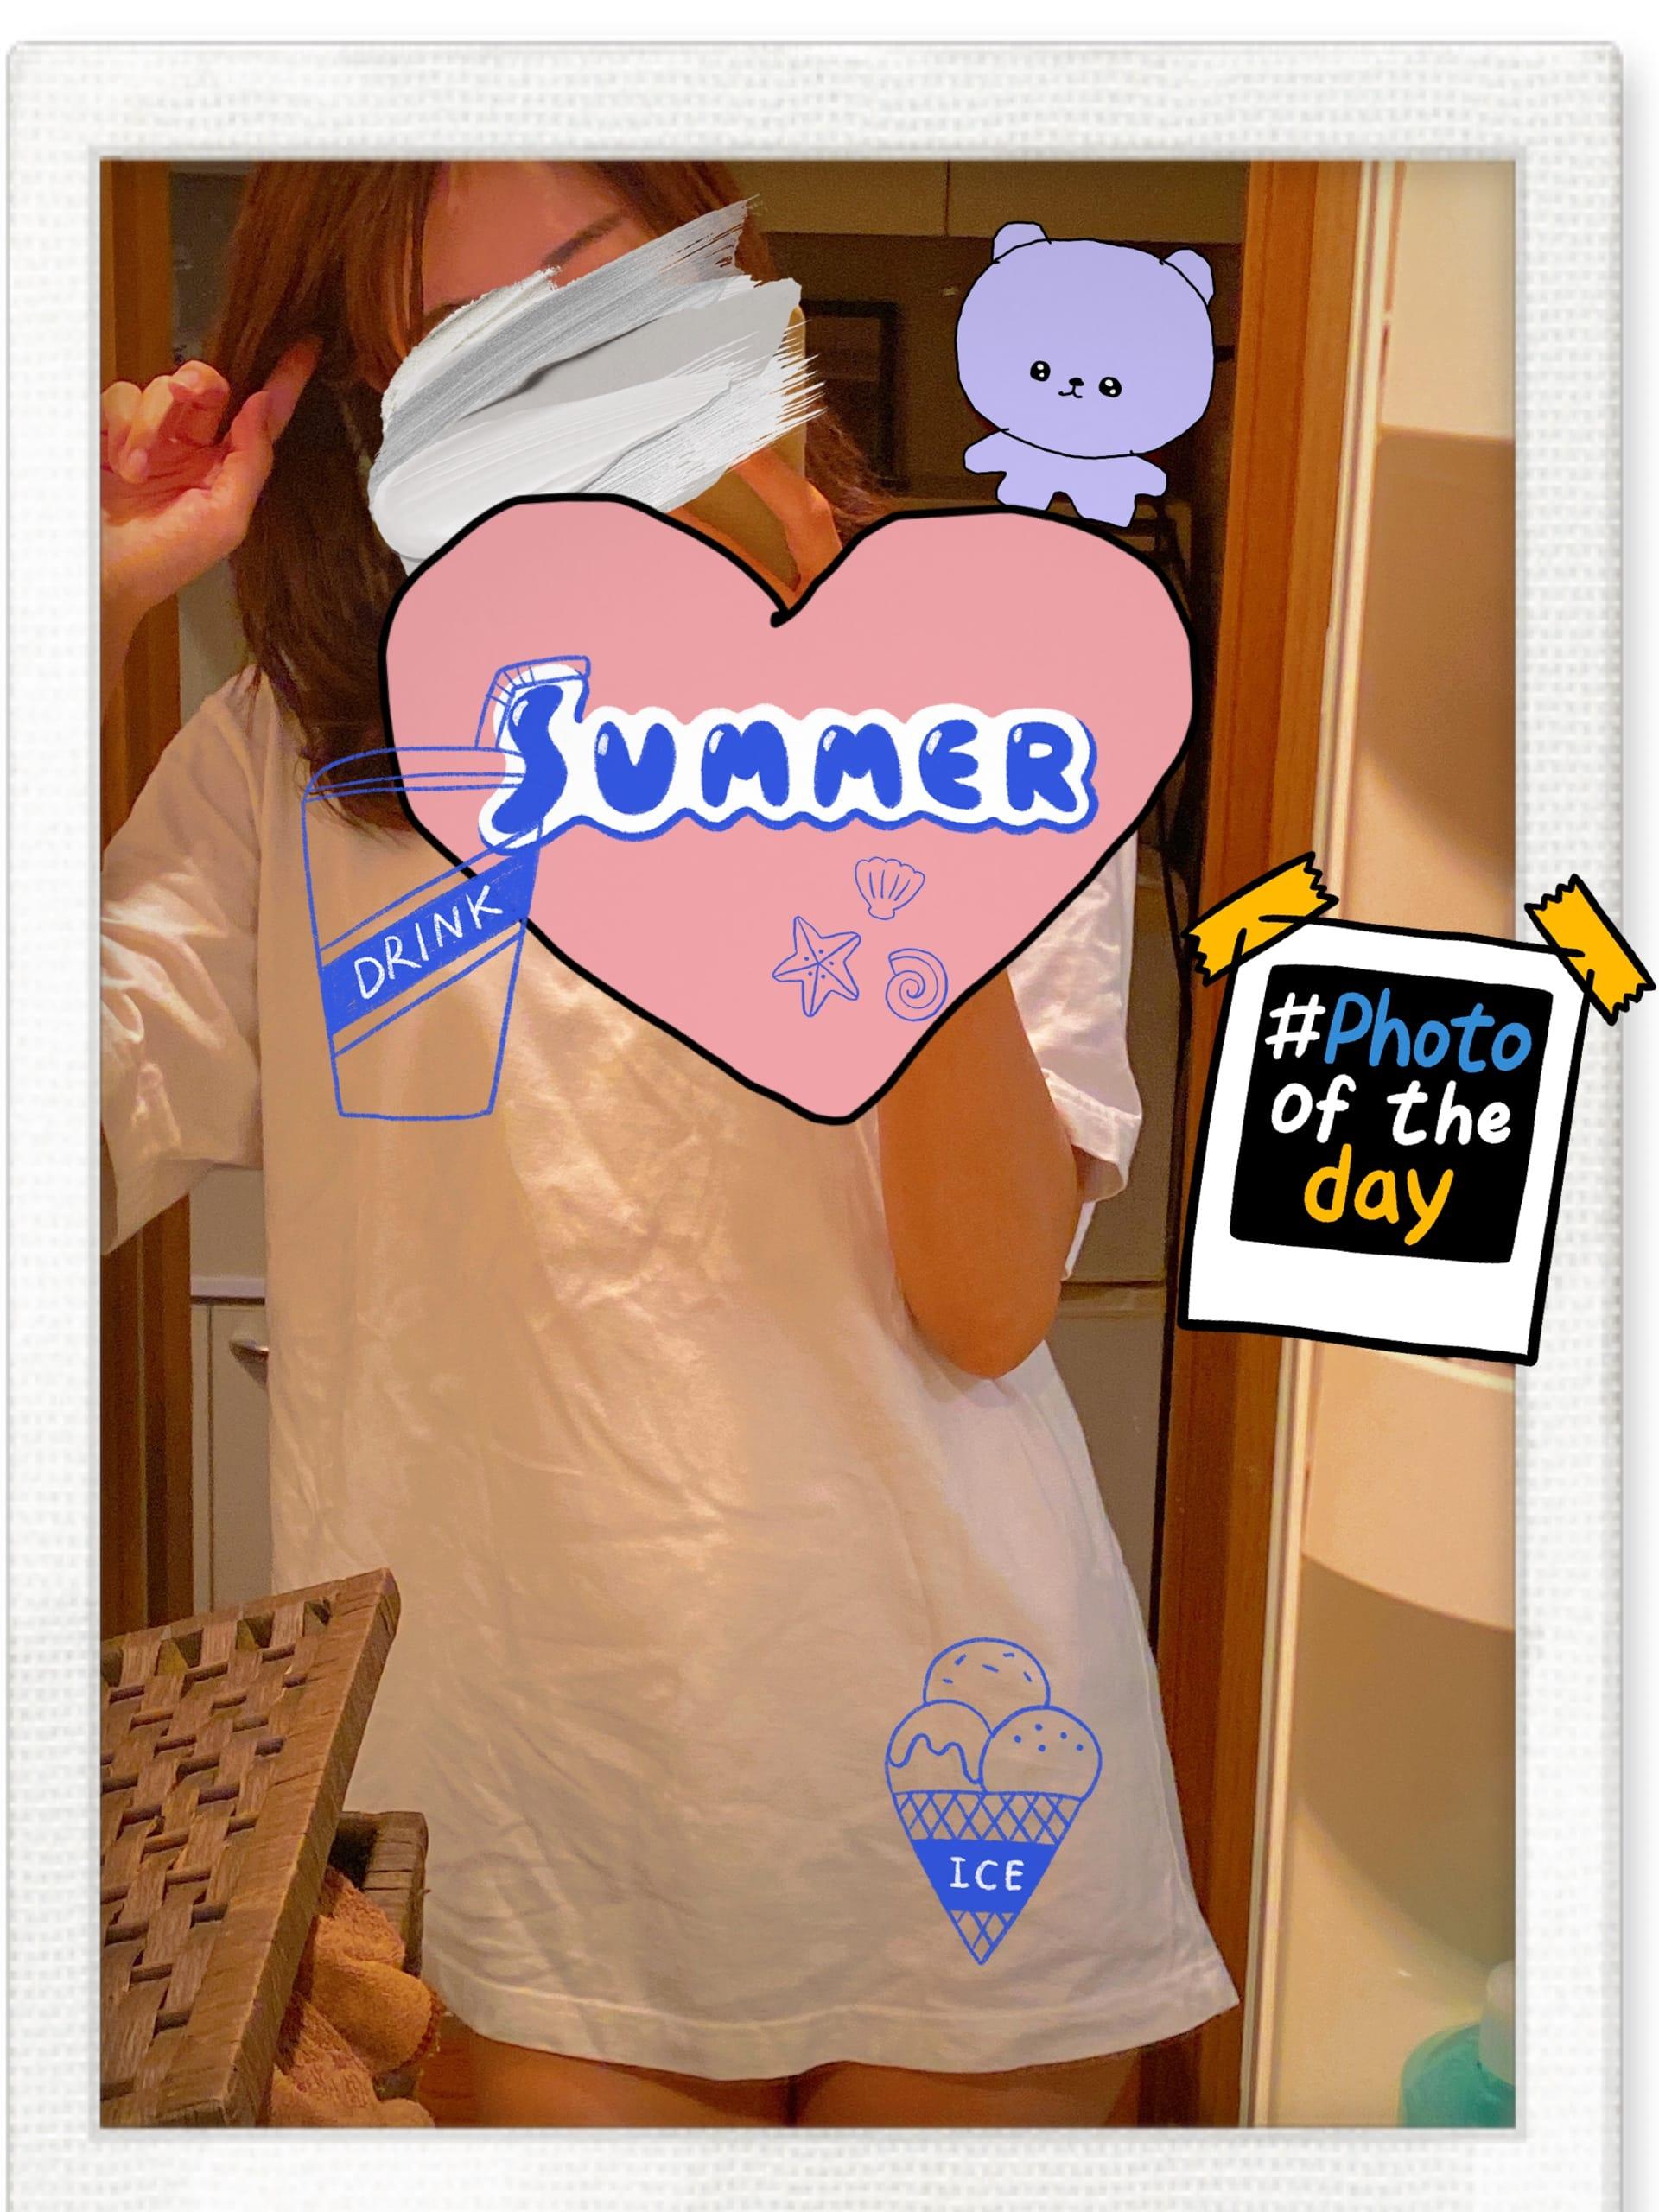 「OP..」07/23(金) 16:07 | 菜々美(ななみ) -DIANAの写メ日記